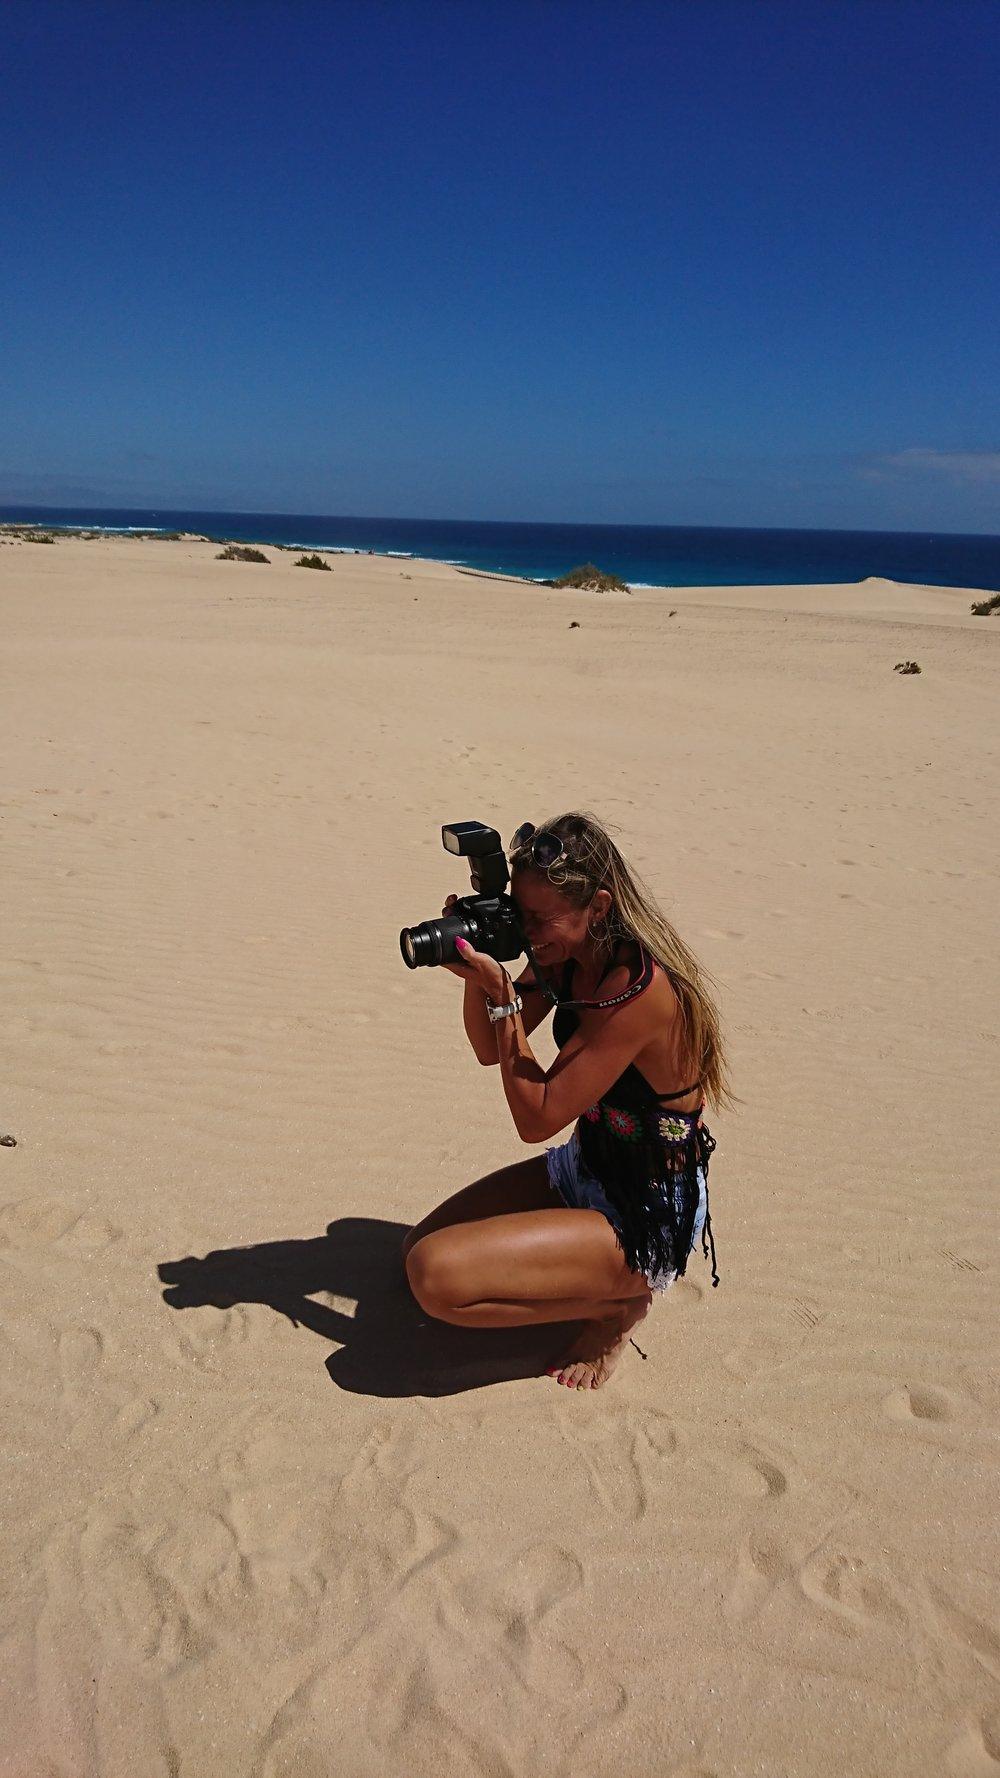 Orsi Mihalyi - Fotofuerteventura - Photoshooting in Fuerteventura!